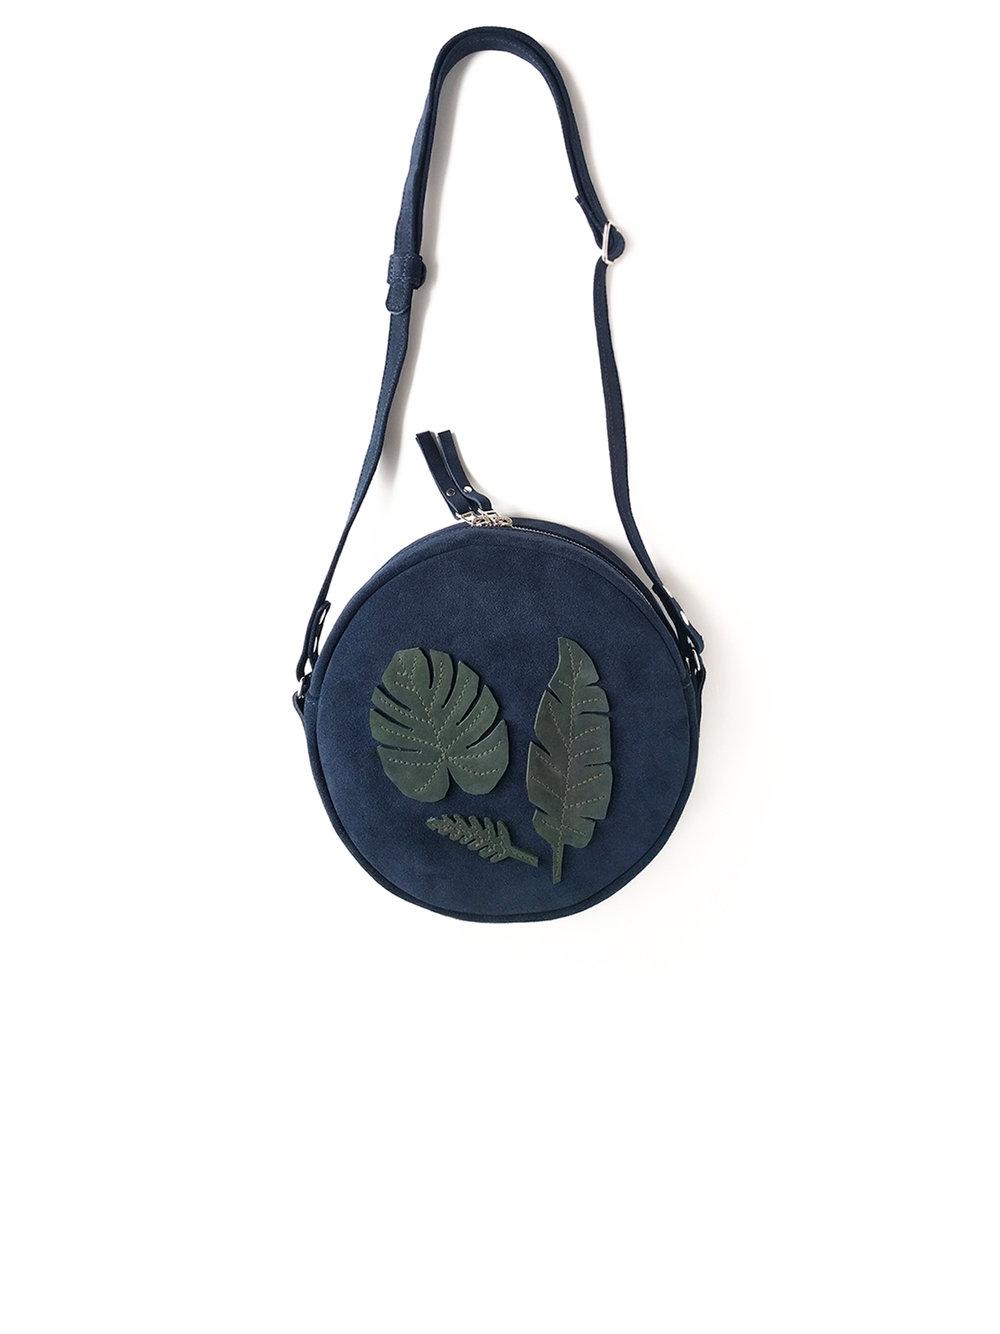 Leaves appliqué Orbit handbag - 200.00$